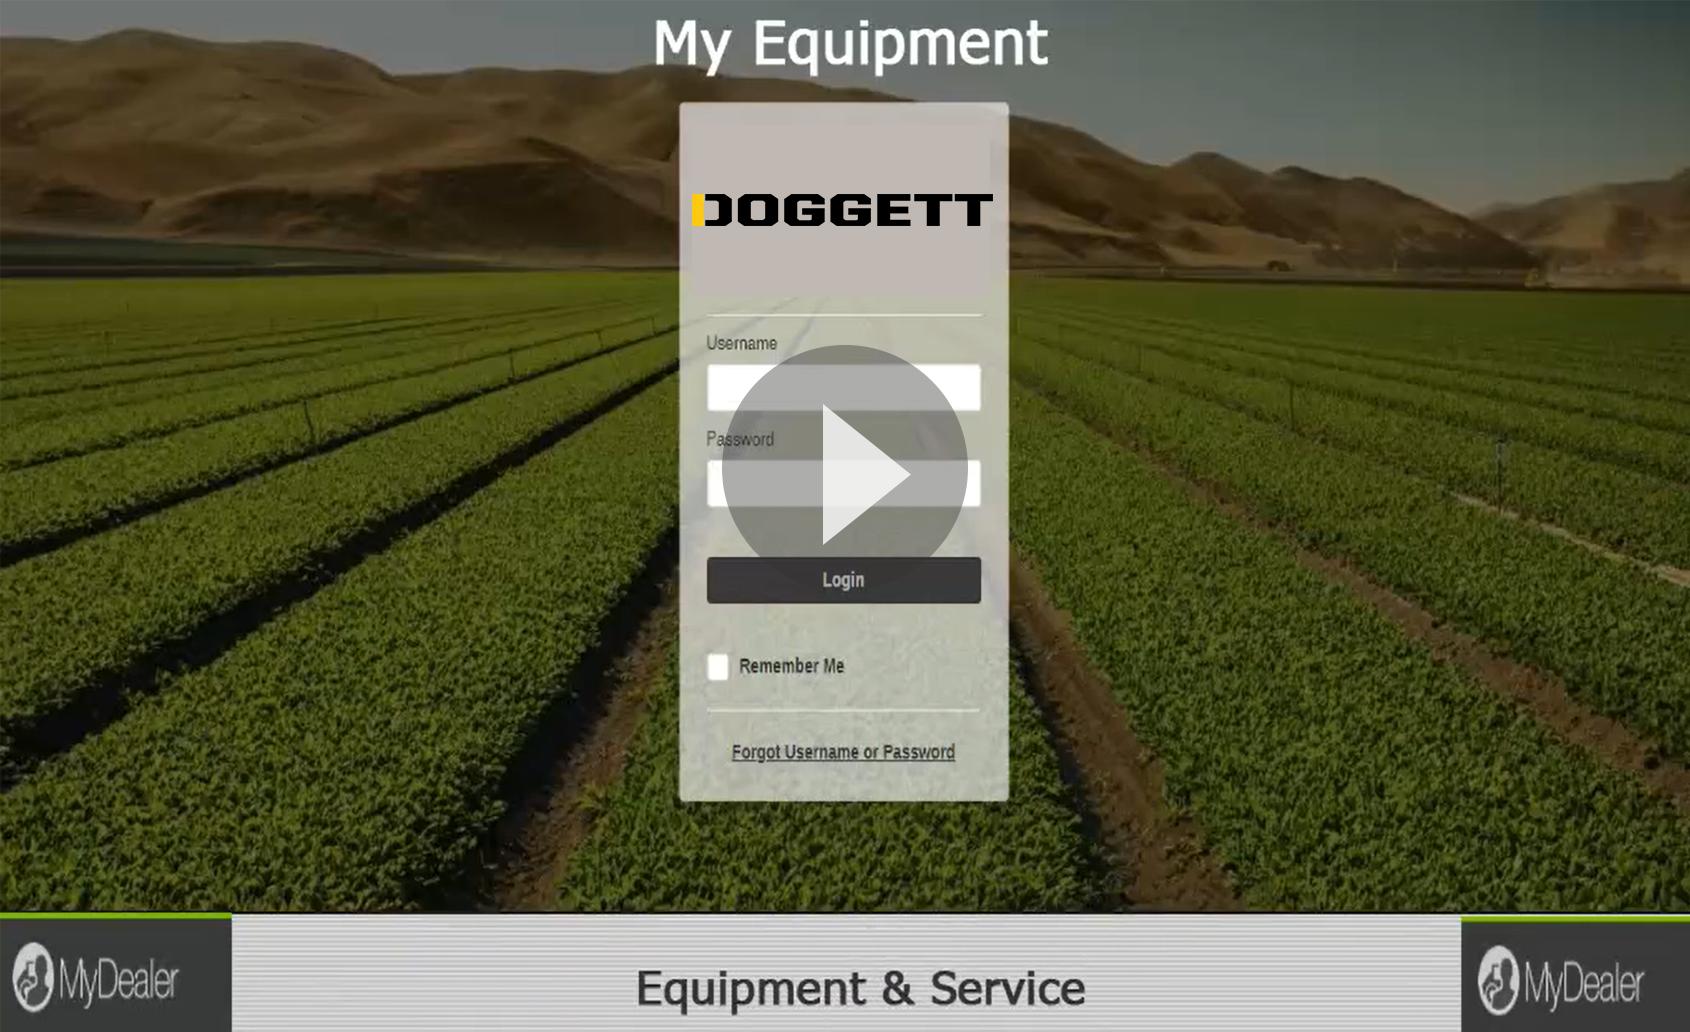 Equipment & Services on Doggett MyDealer Portal